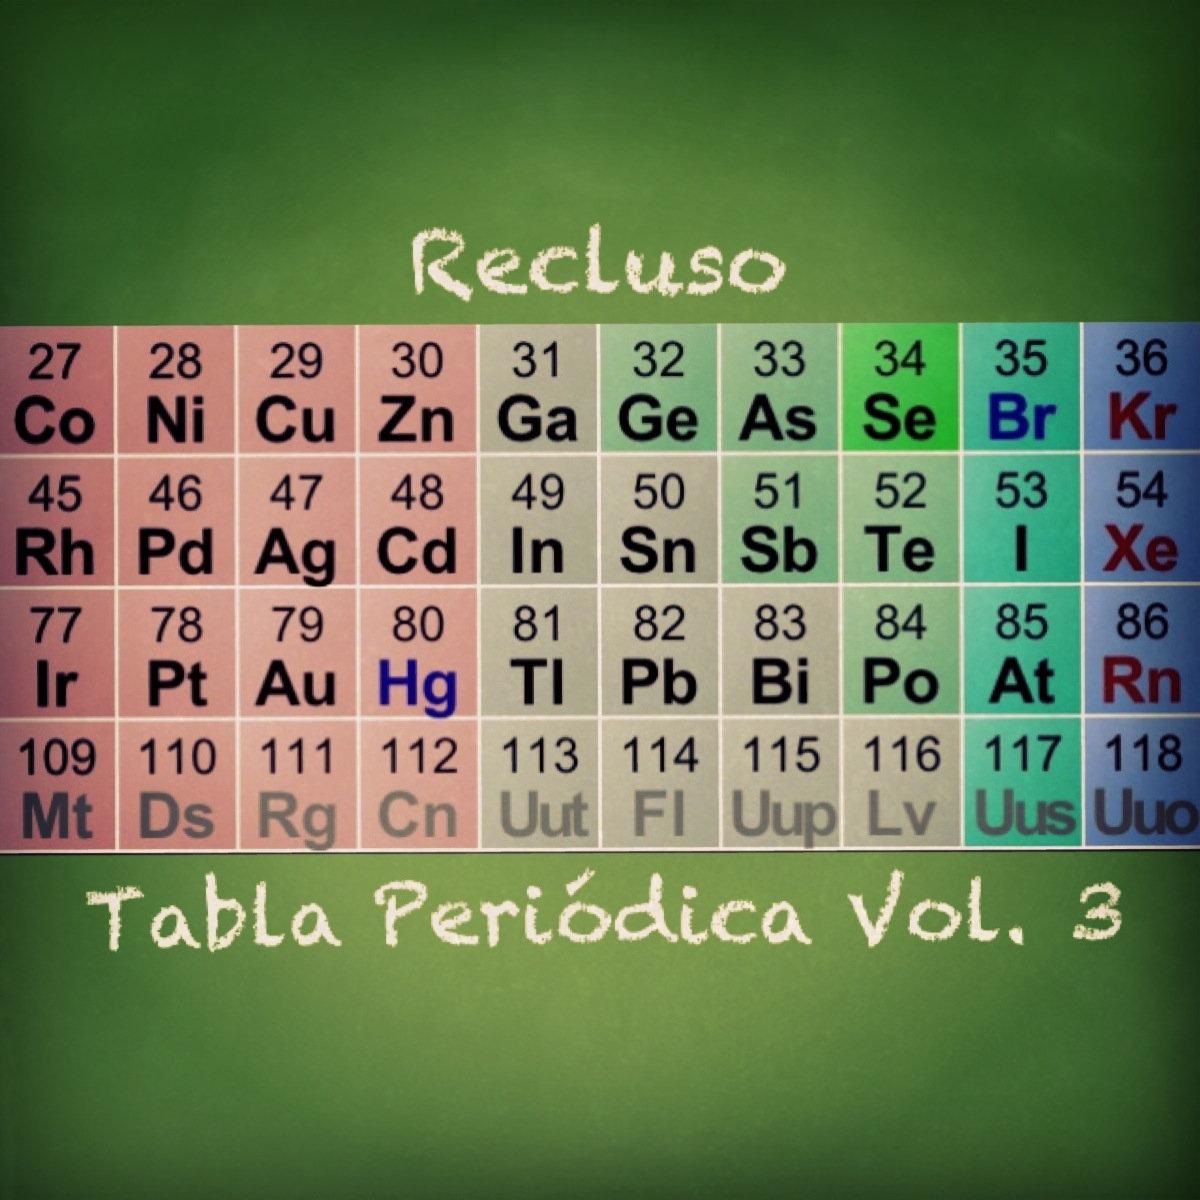 Prometio recluso from tabla peridica vol 3 by recluso urtaz Choice Image